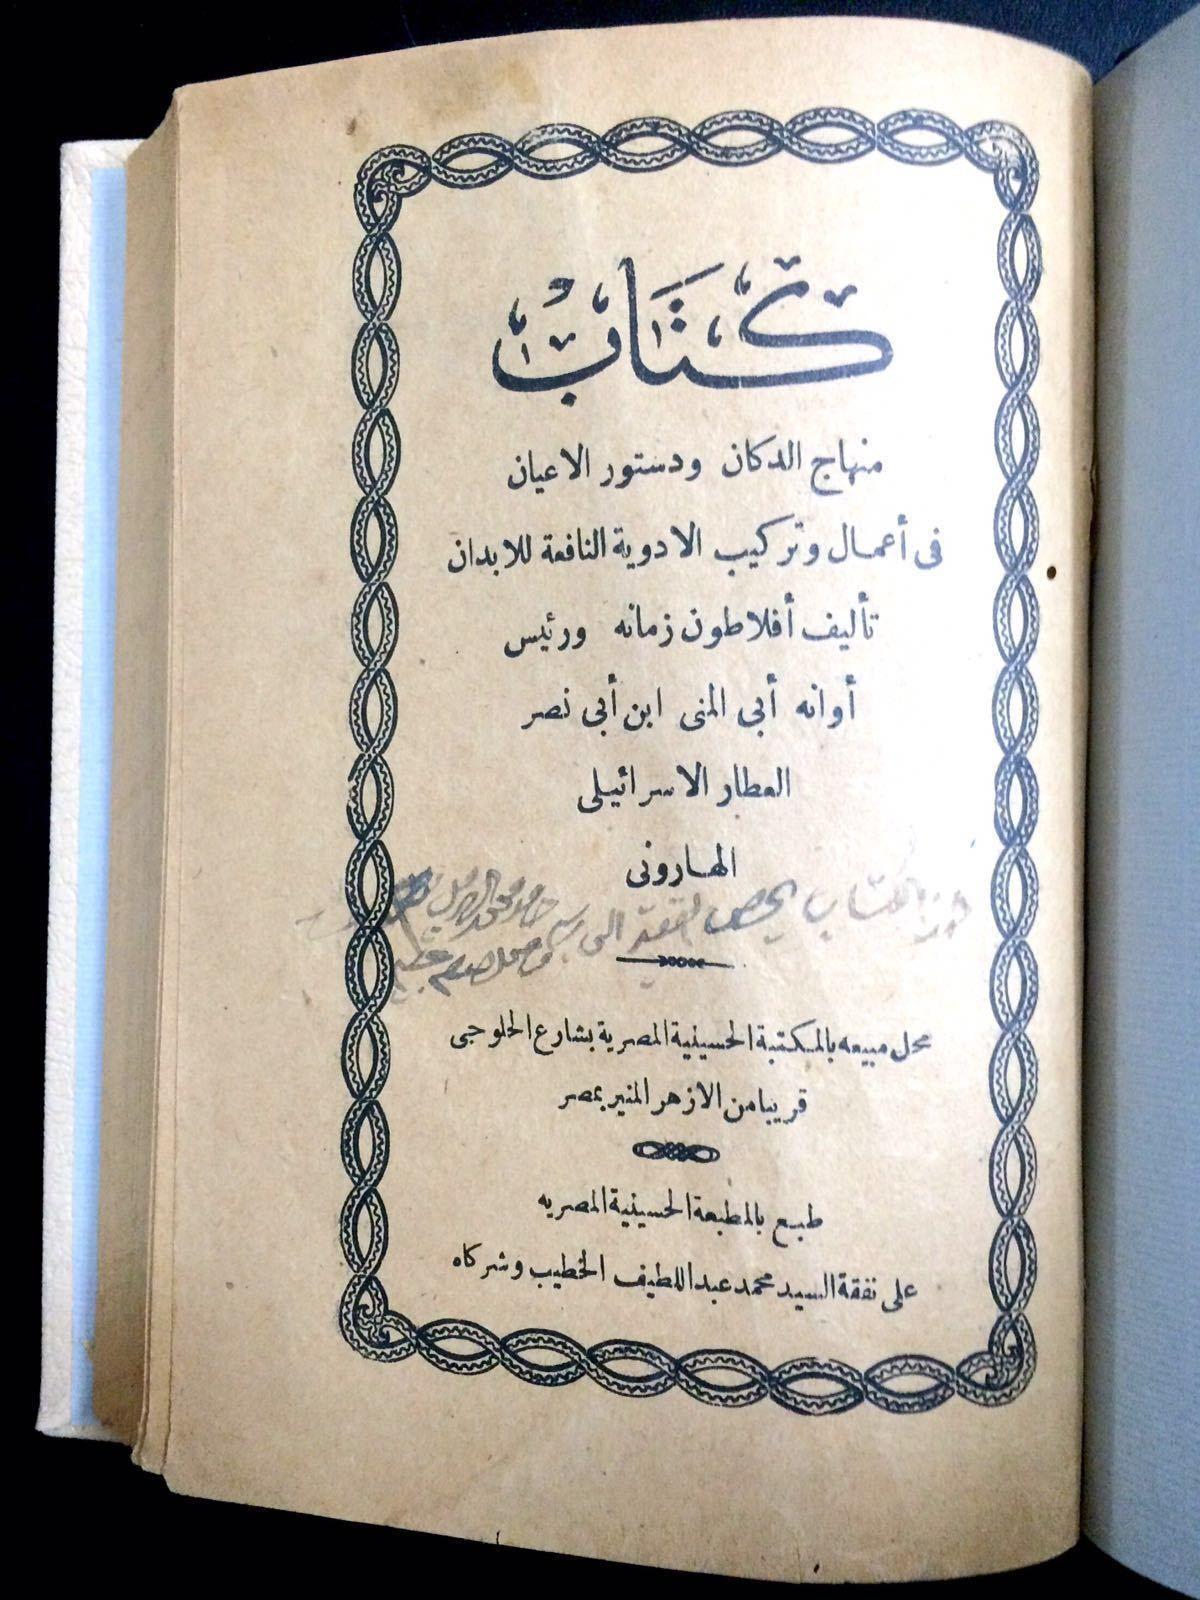 Old Rare Medical Book In Arabic P In 1912 In Cairo Menhag Al Dokkan Cairo Medical Olds